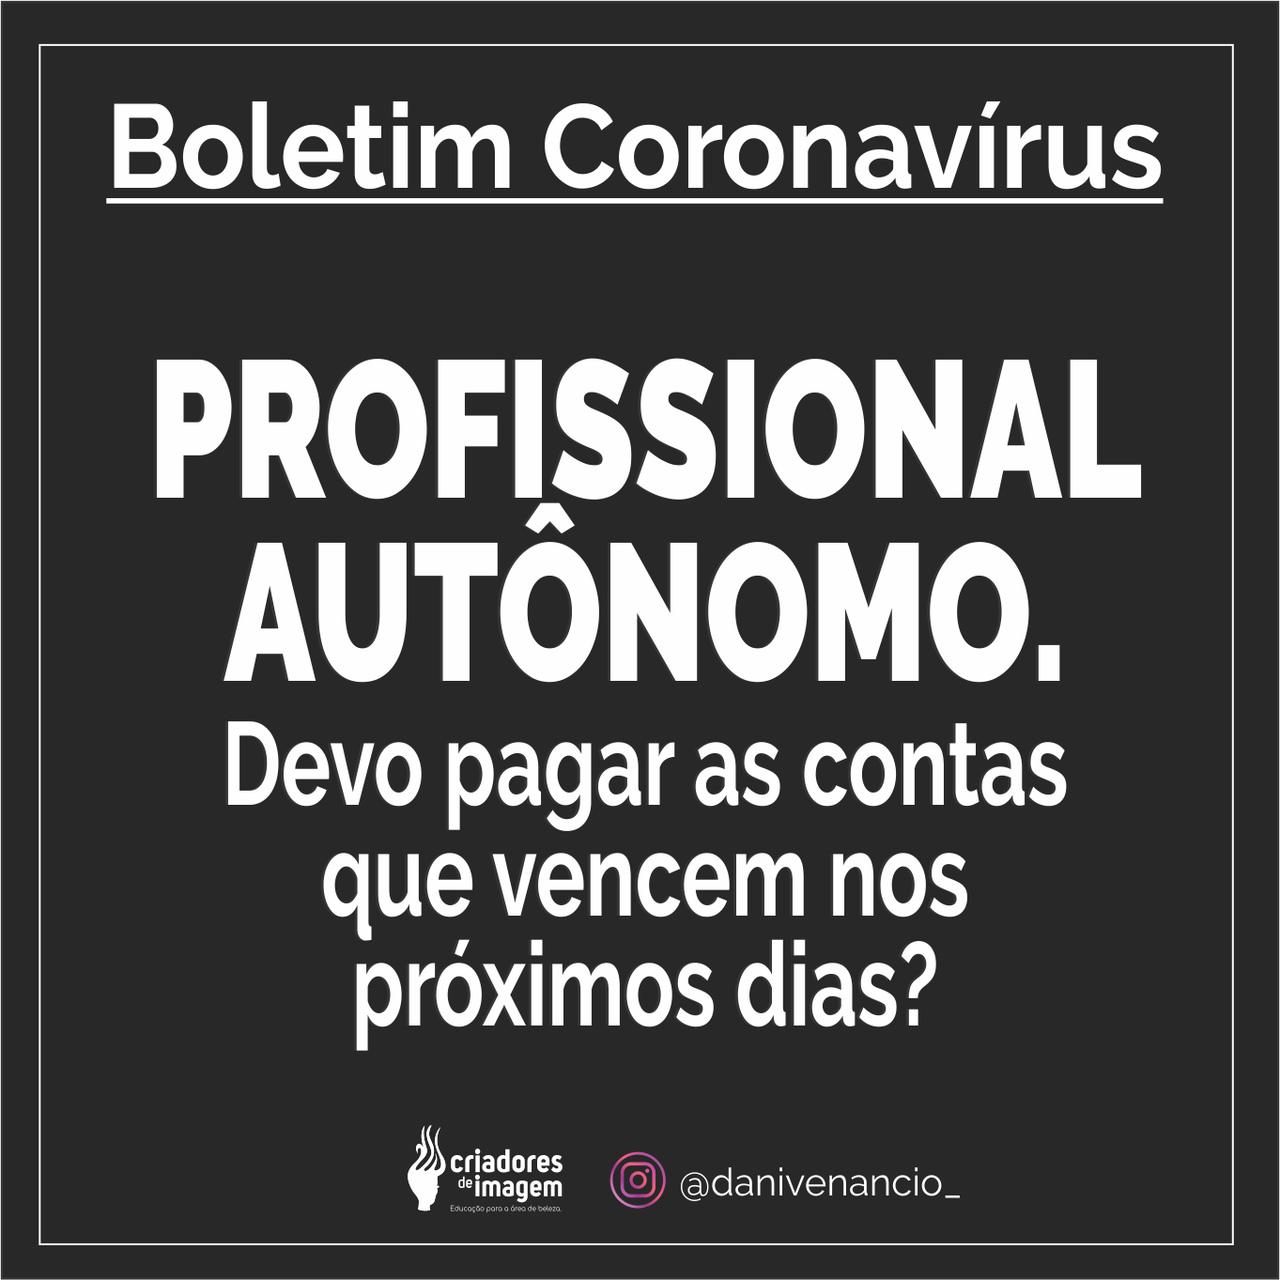 profissional autonomo contas a pagar coronavirus